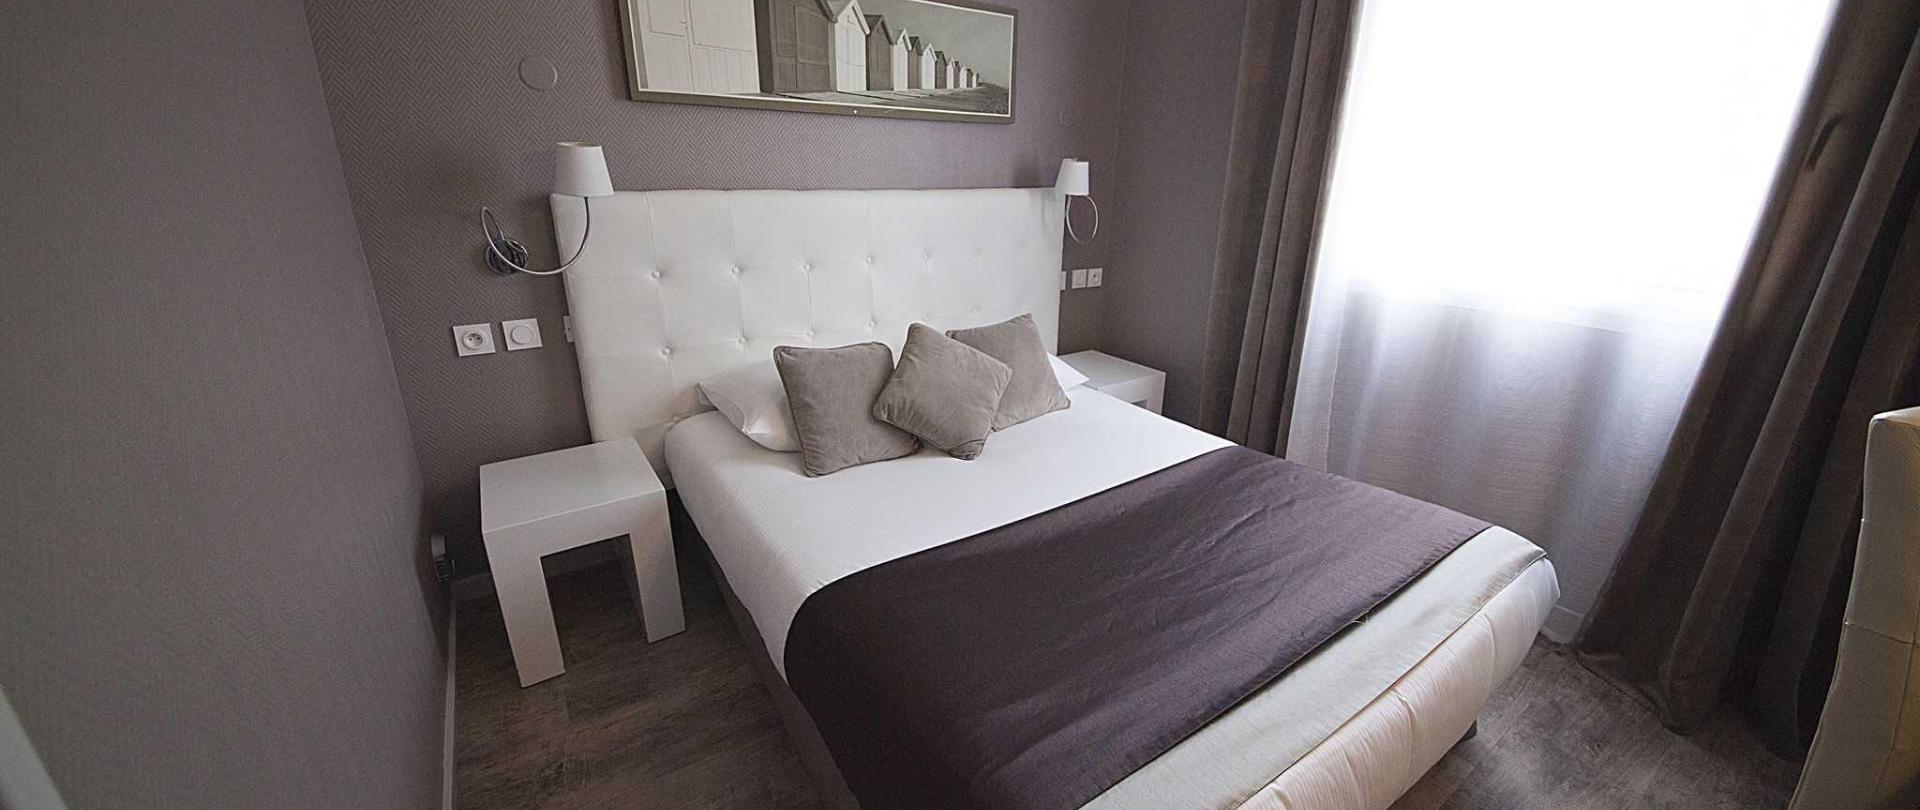 chambres-11-hotel-clermont-ferrand-pardieu-belle-inn.jpg